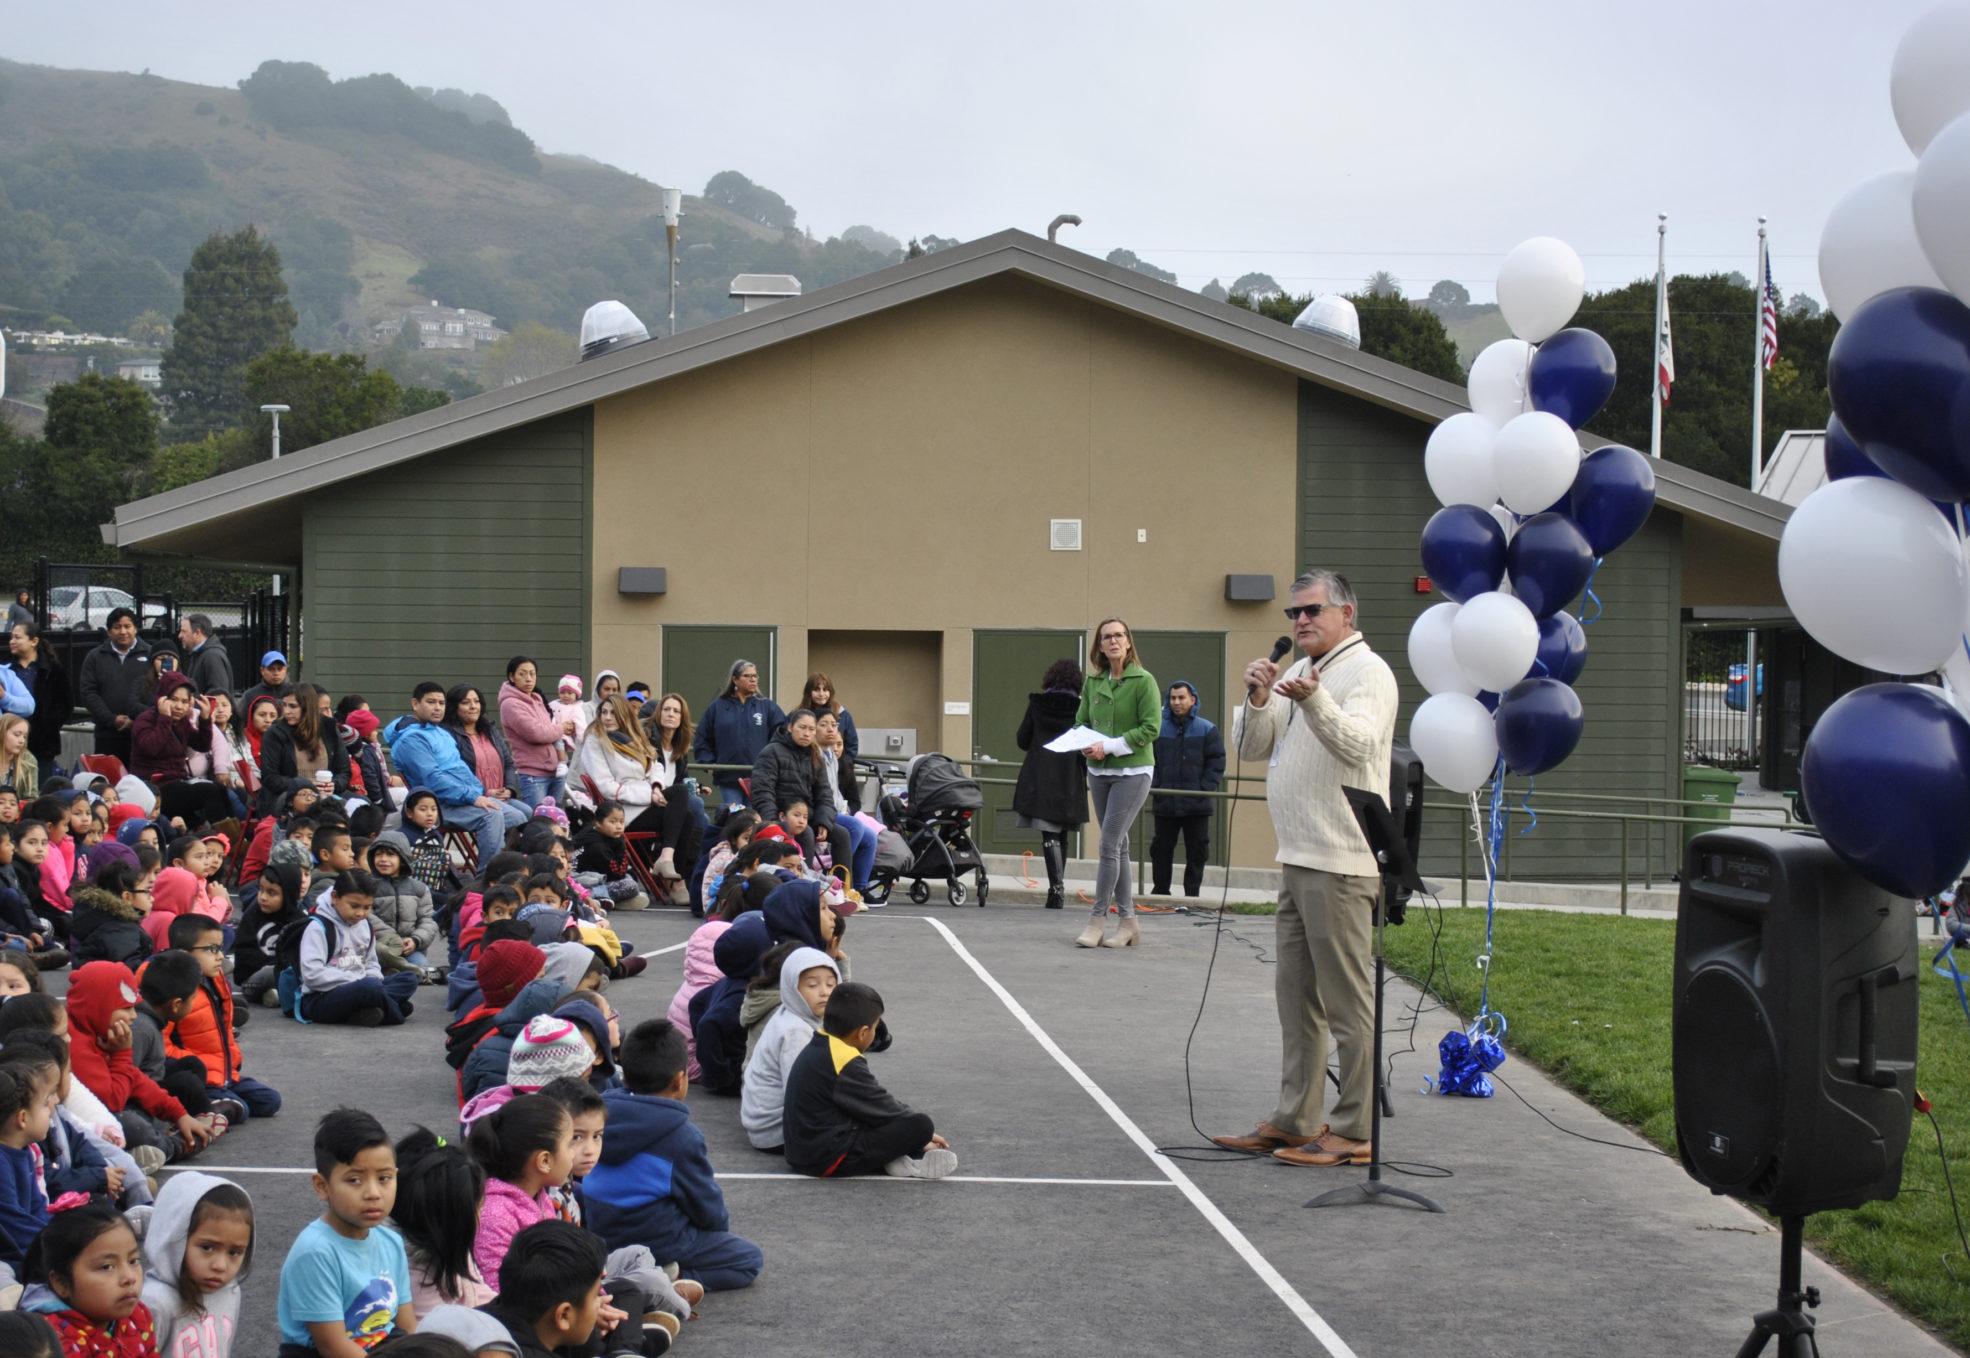 Jl Modular Blog Category – Jl Construction Inside San Rafael Unified School District Calendar